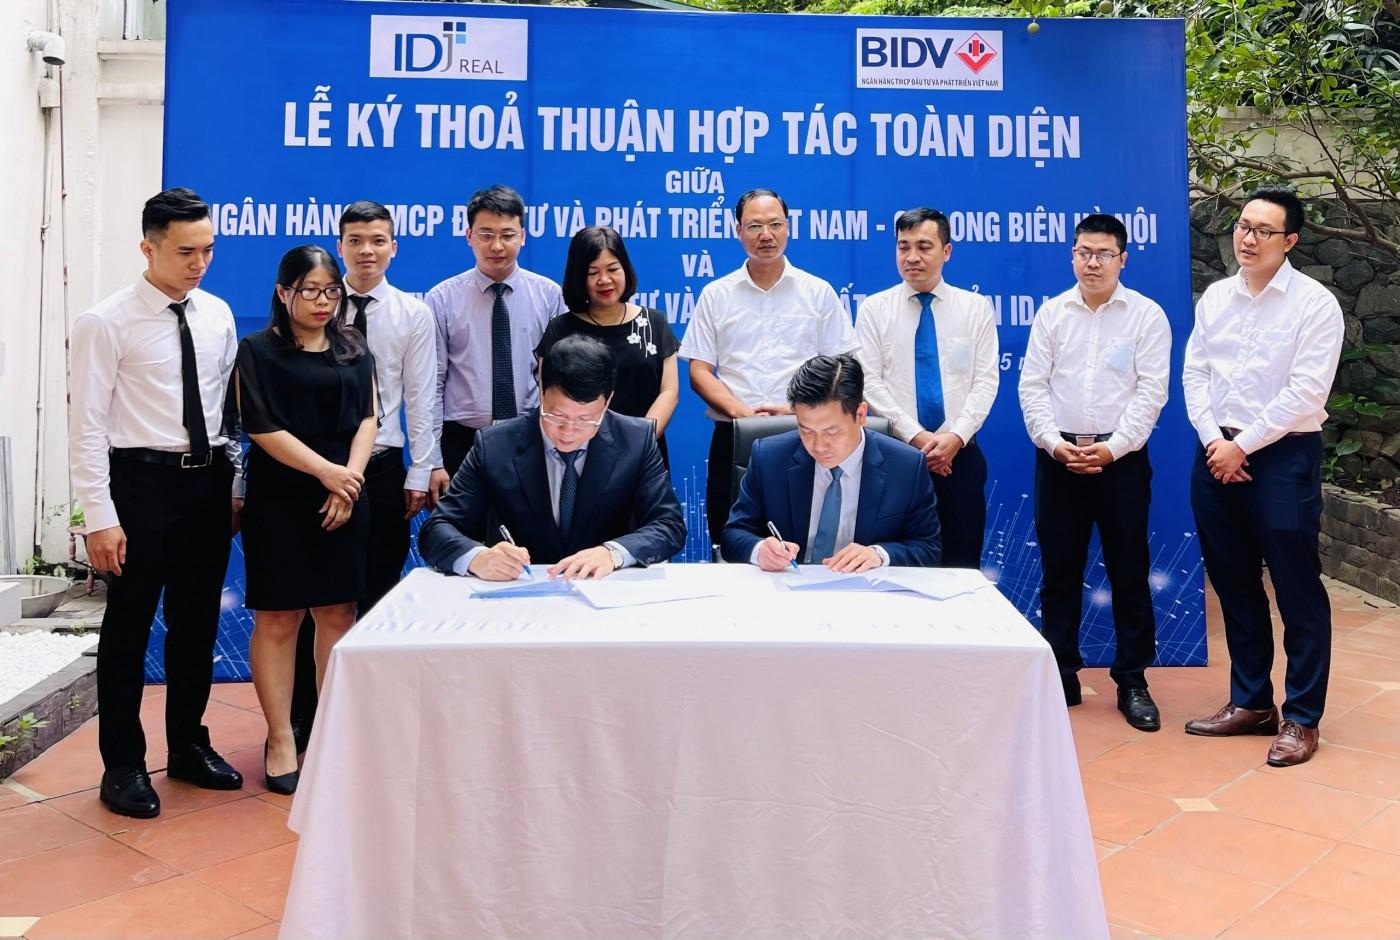 IDJ Real and BIDV sign contract